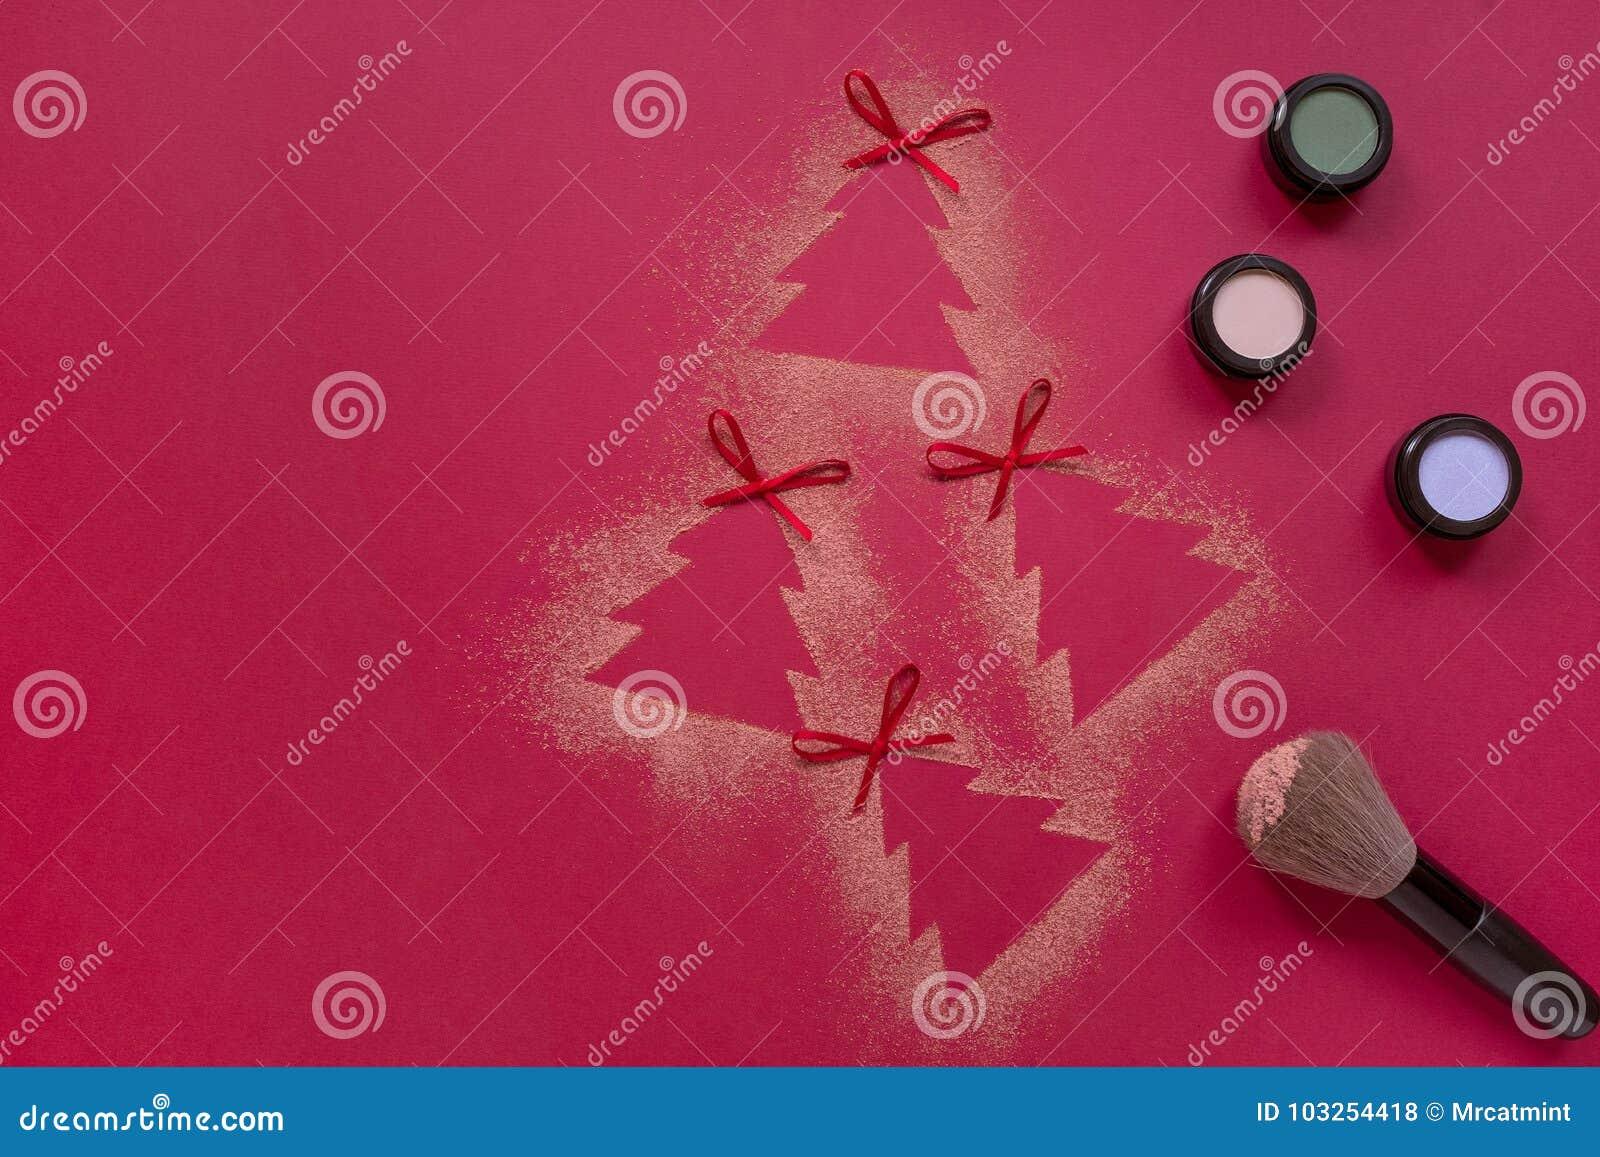 Christmas Eyeshadows Makeup Flat Lay, Christmas Tree Shapes